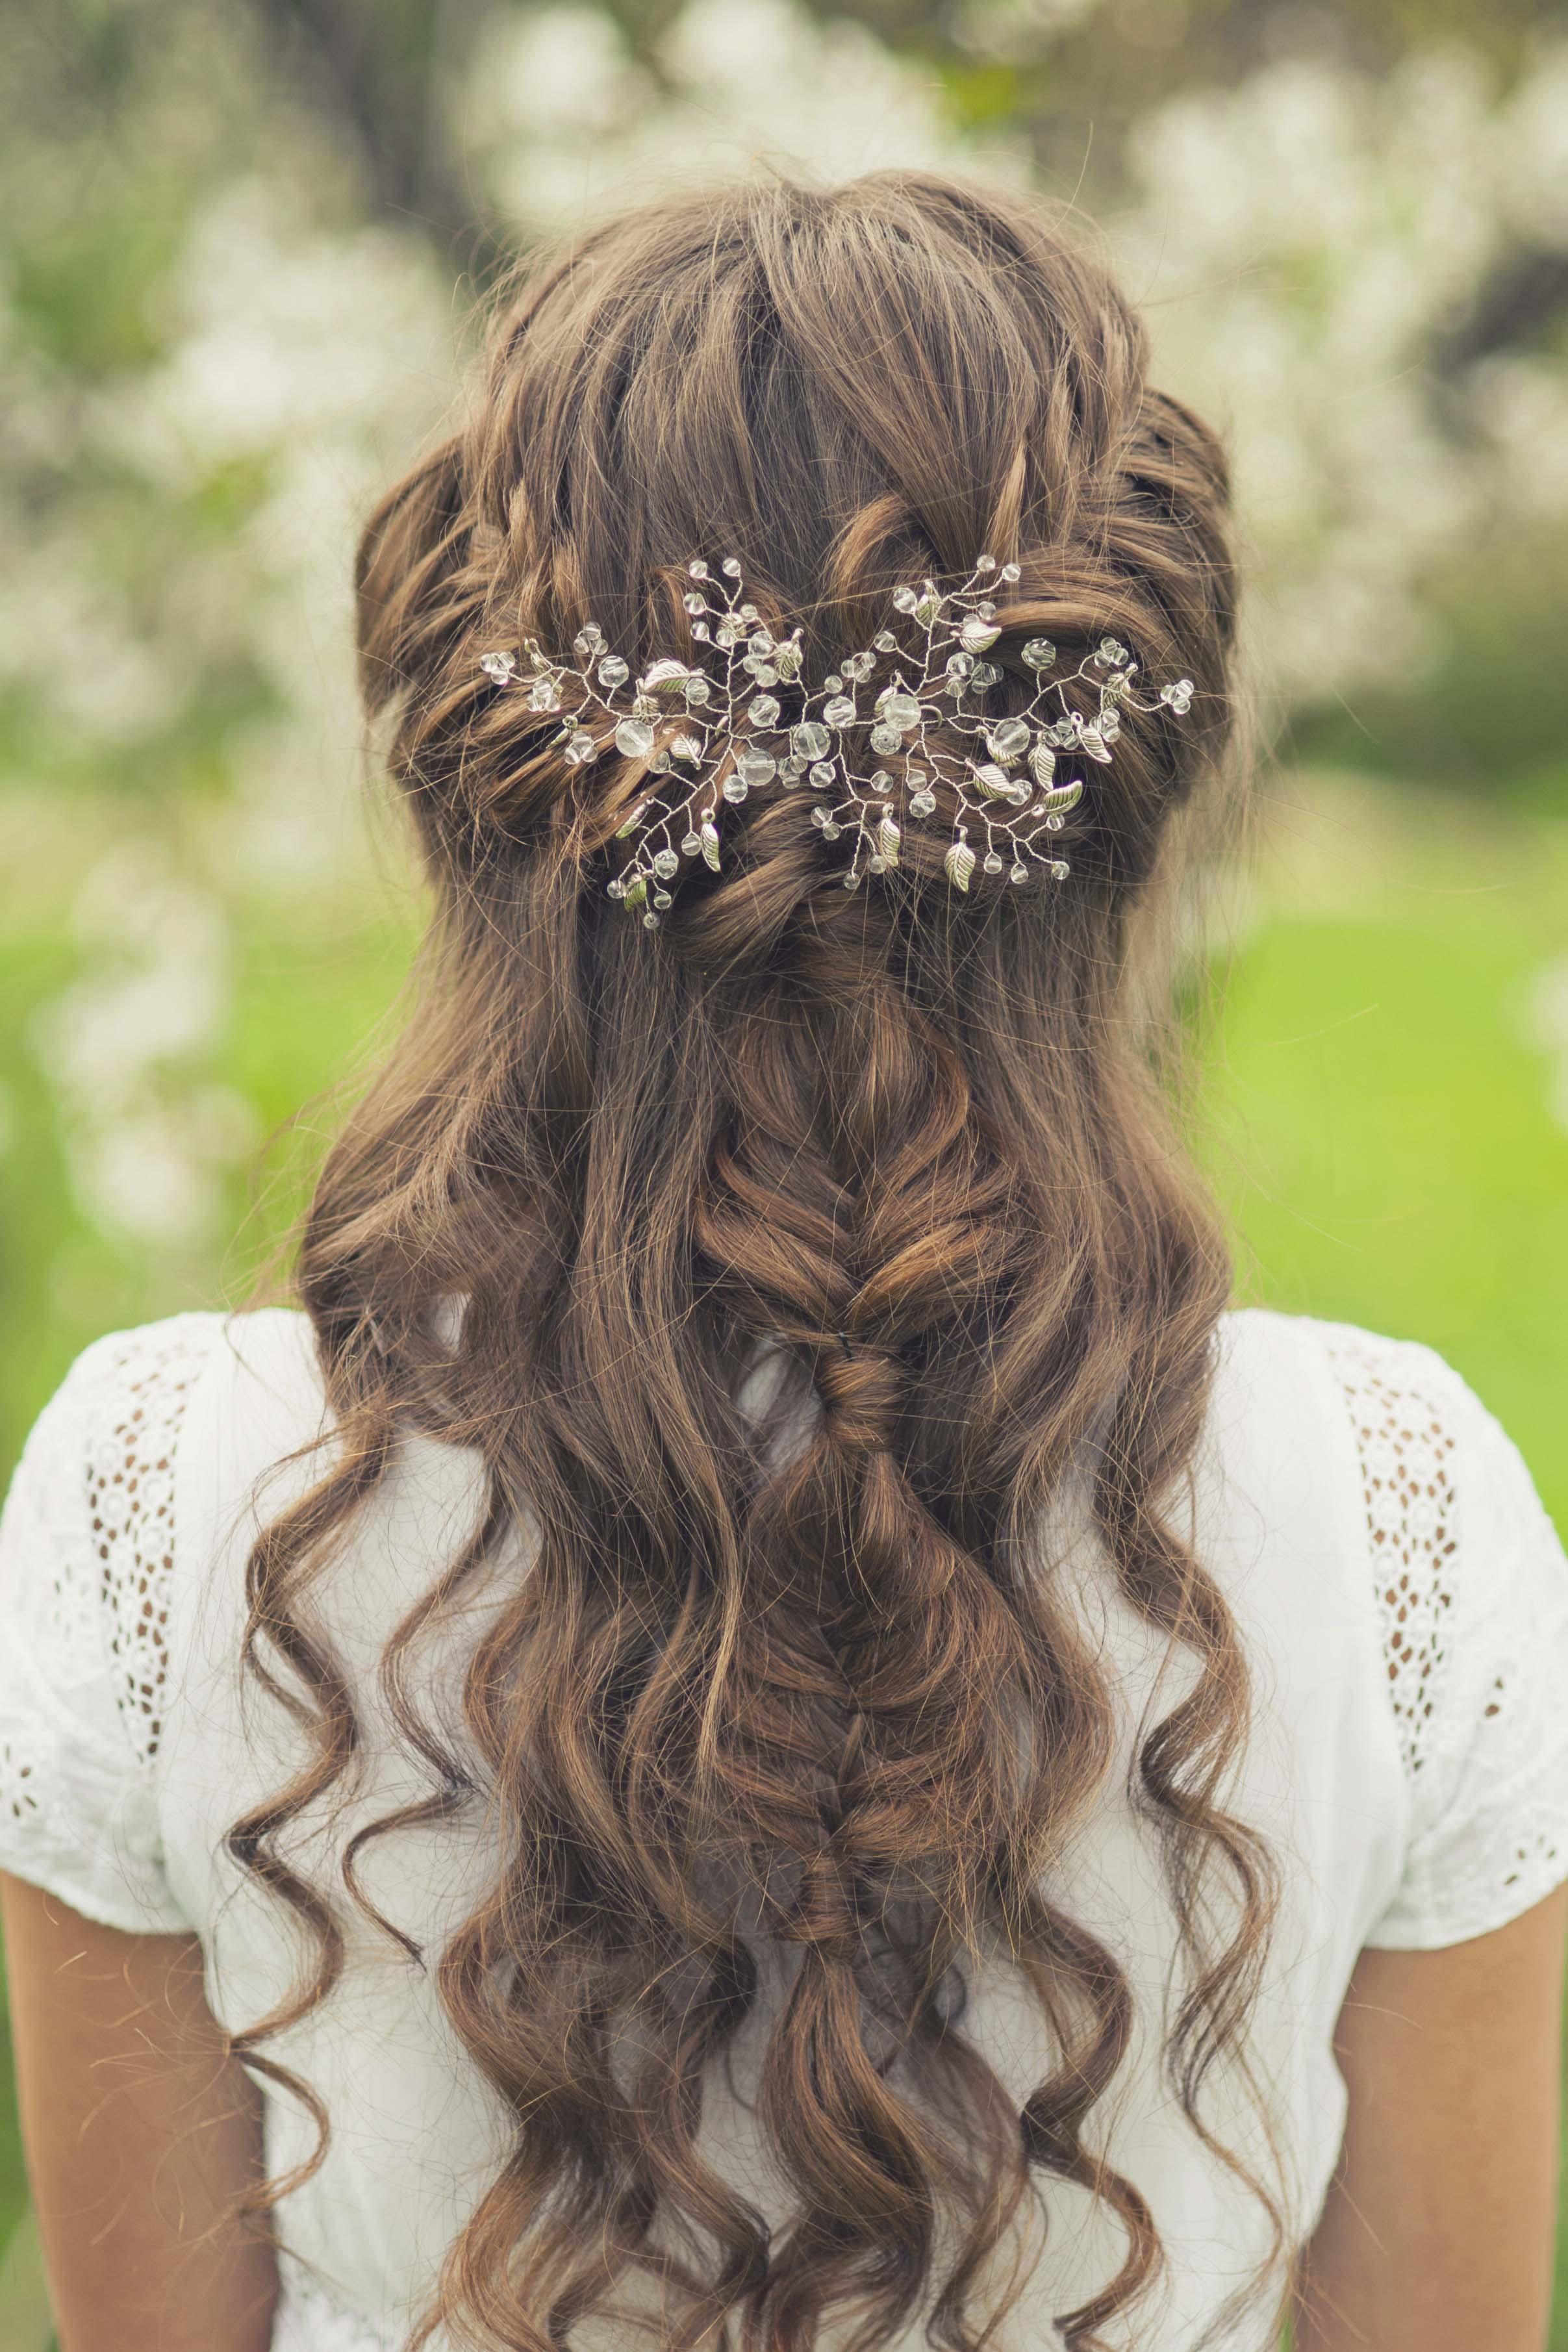 creating classic wedding hairstyles half-updo